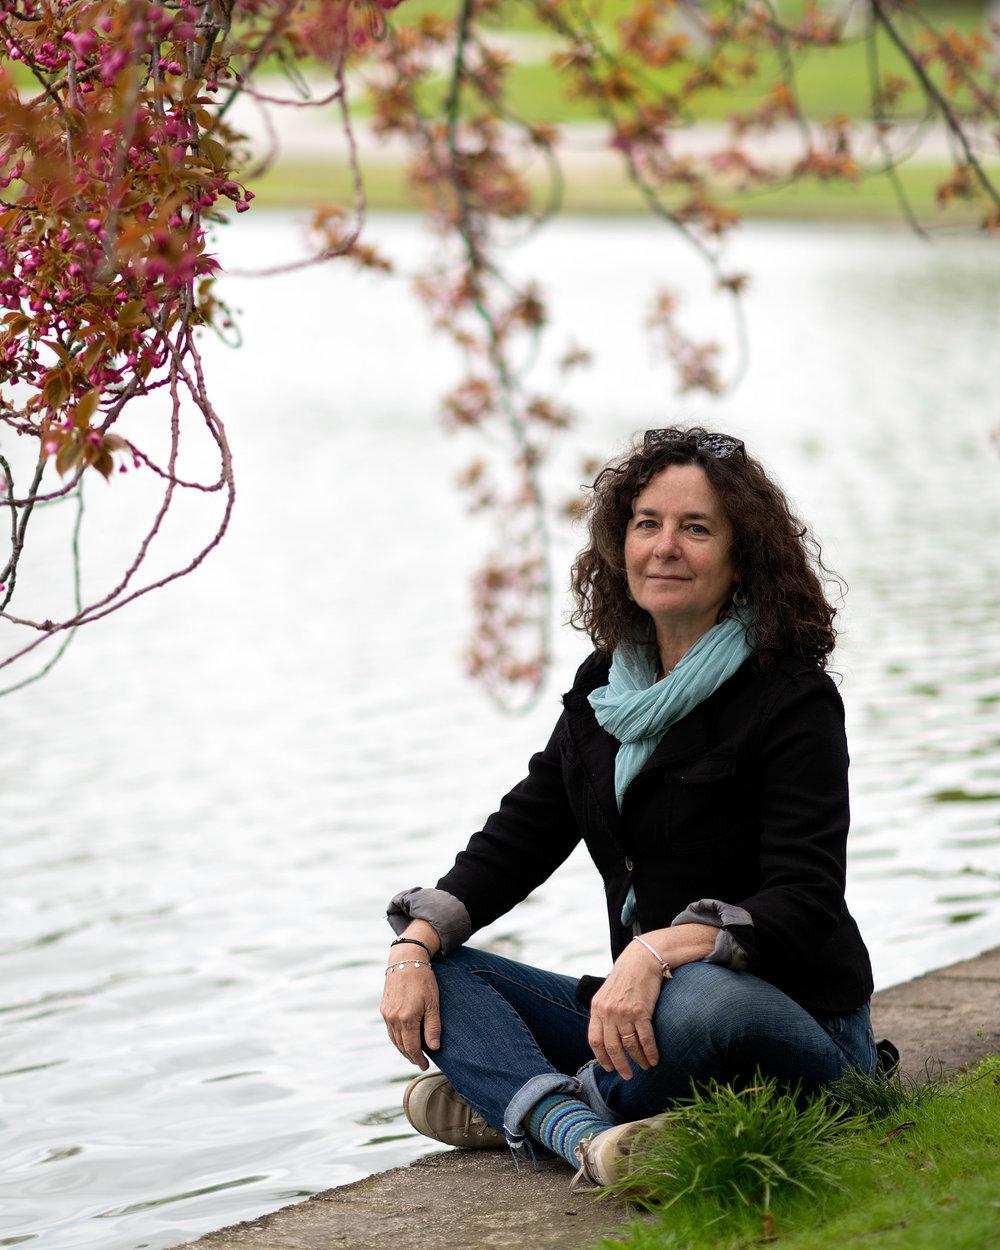 Sara-Portrait-at-Green-Wood.jpg